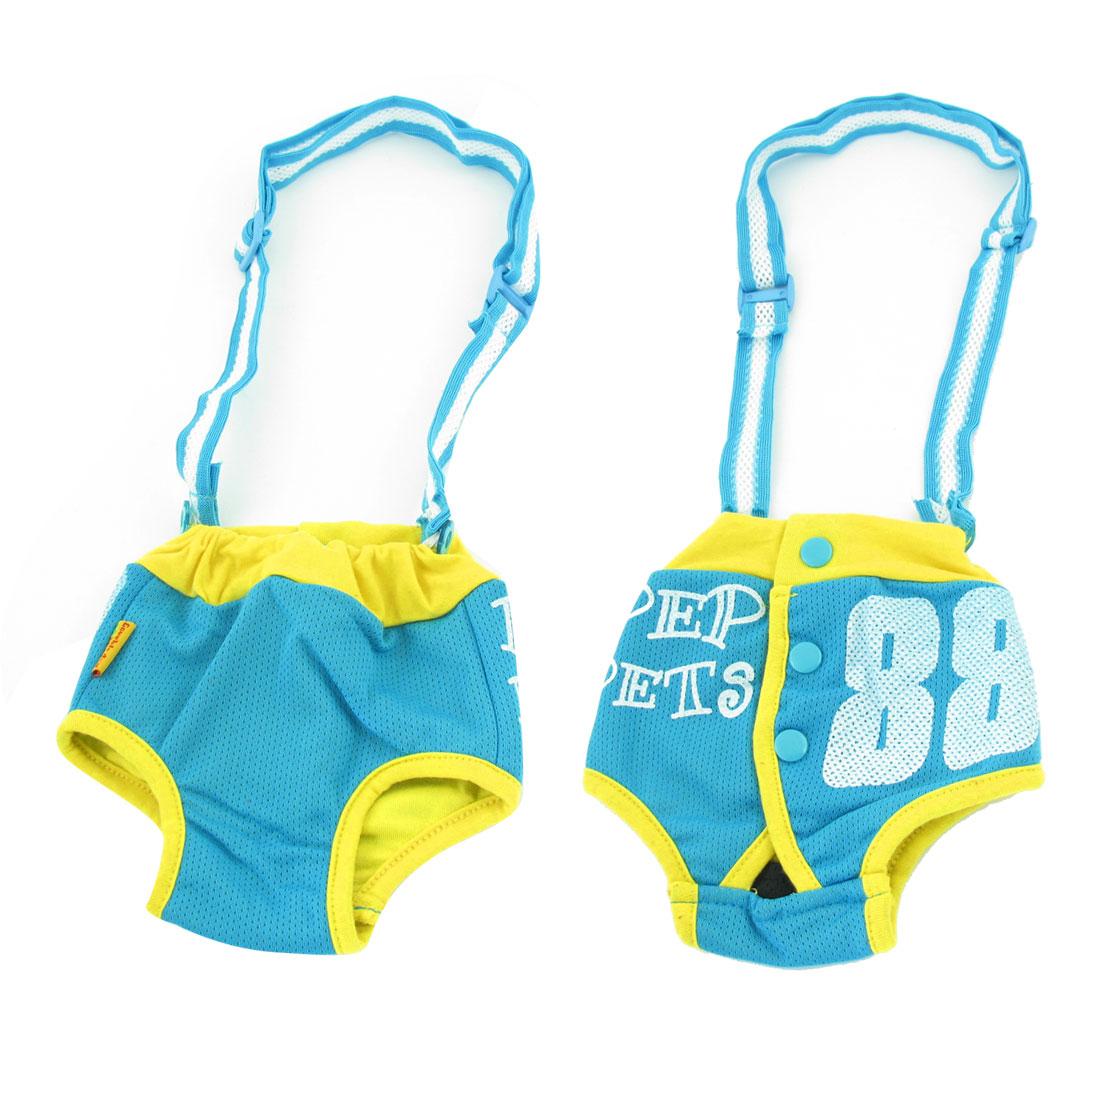 Teal Pet Dog Meshy Suspender Elastic Waist Underwear Diaper Pants XS